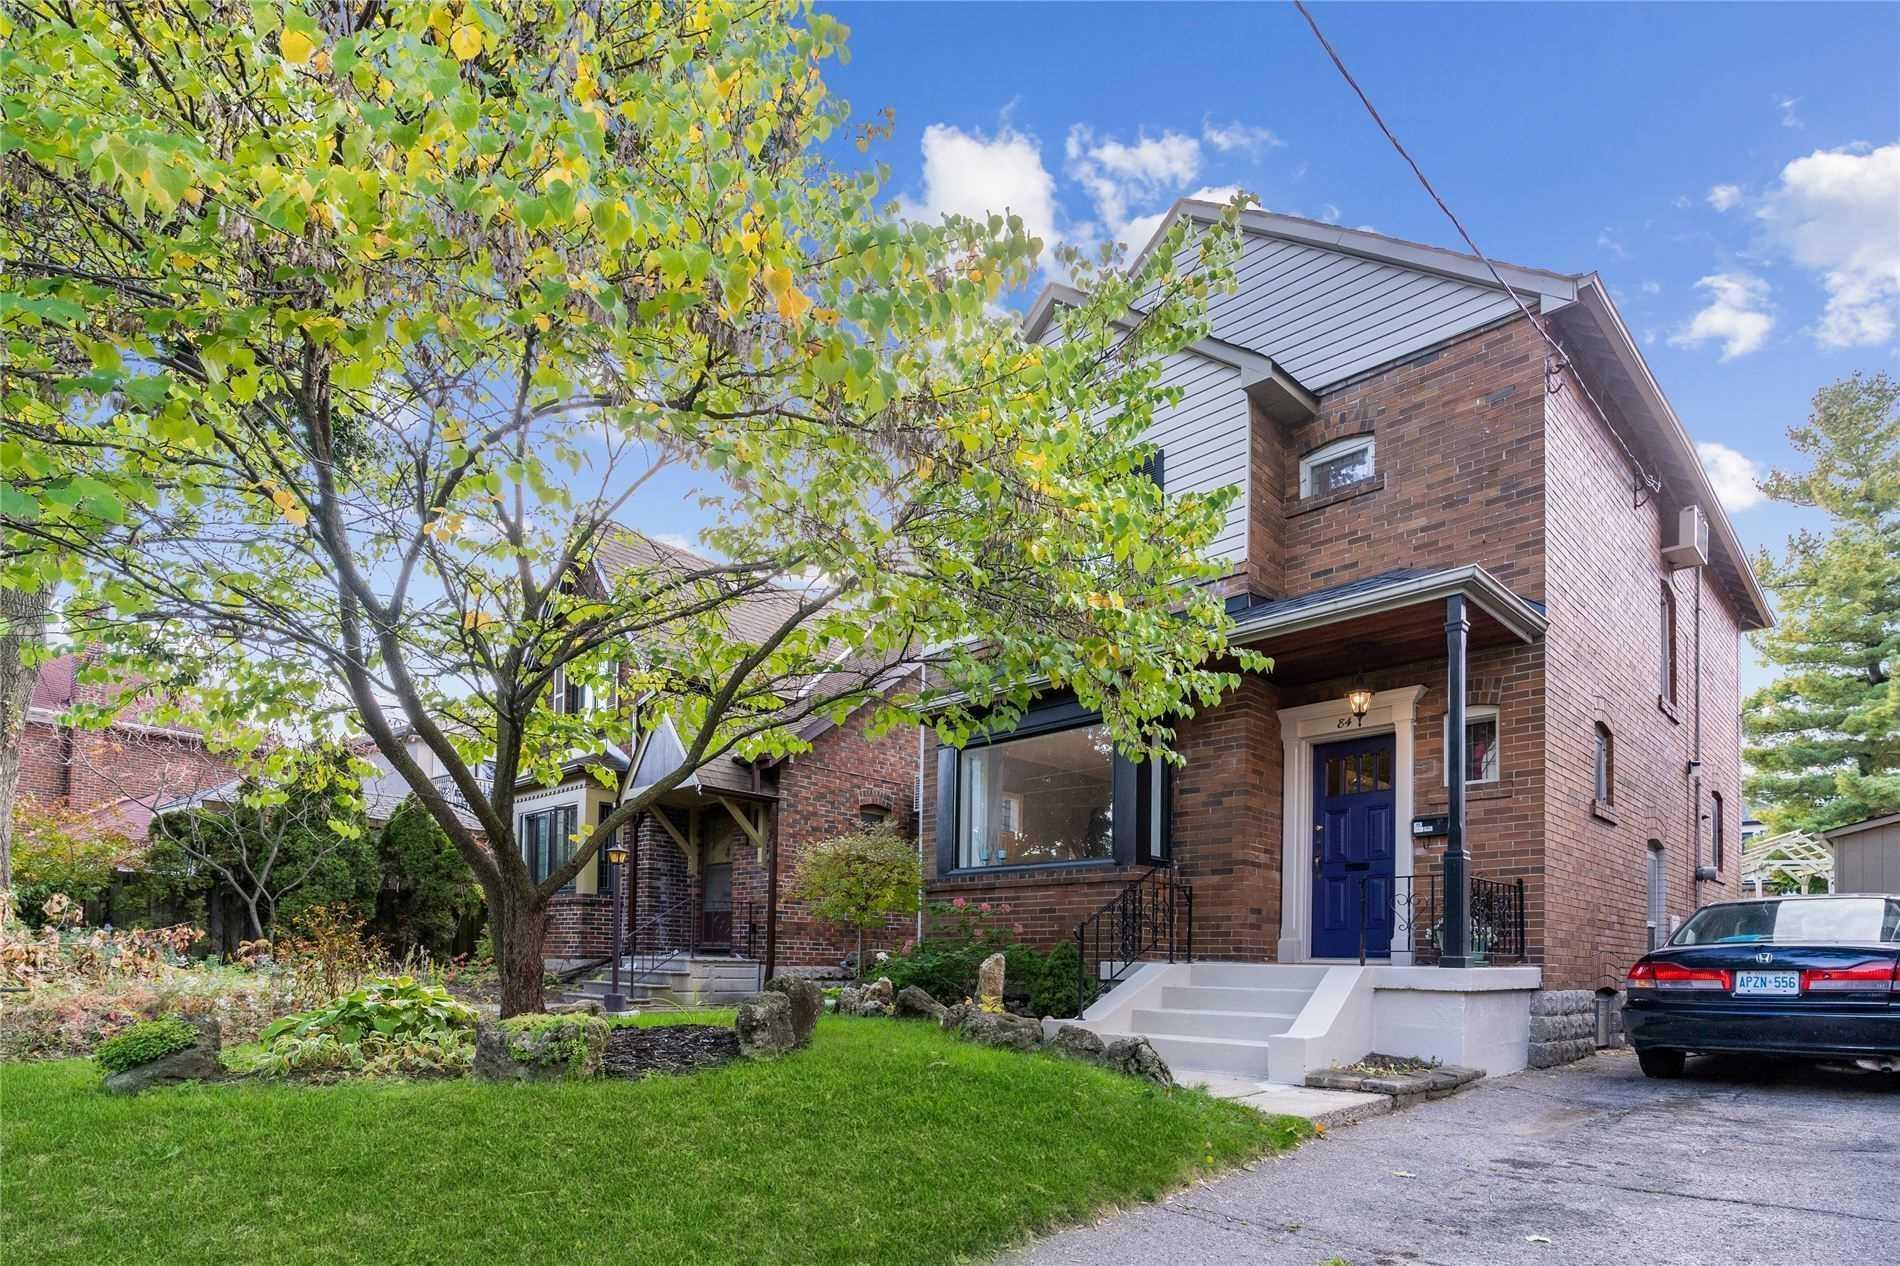 84 Hanna Rd, Toronto, Ontario M4G3N3, 3 Bedrooms Bedrooms, 6 Rooms Rooms,2 BathroomsBathrooms,Detached,For Sale,Hanna,C5364985